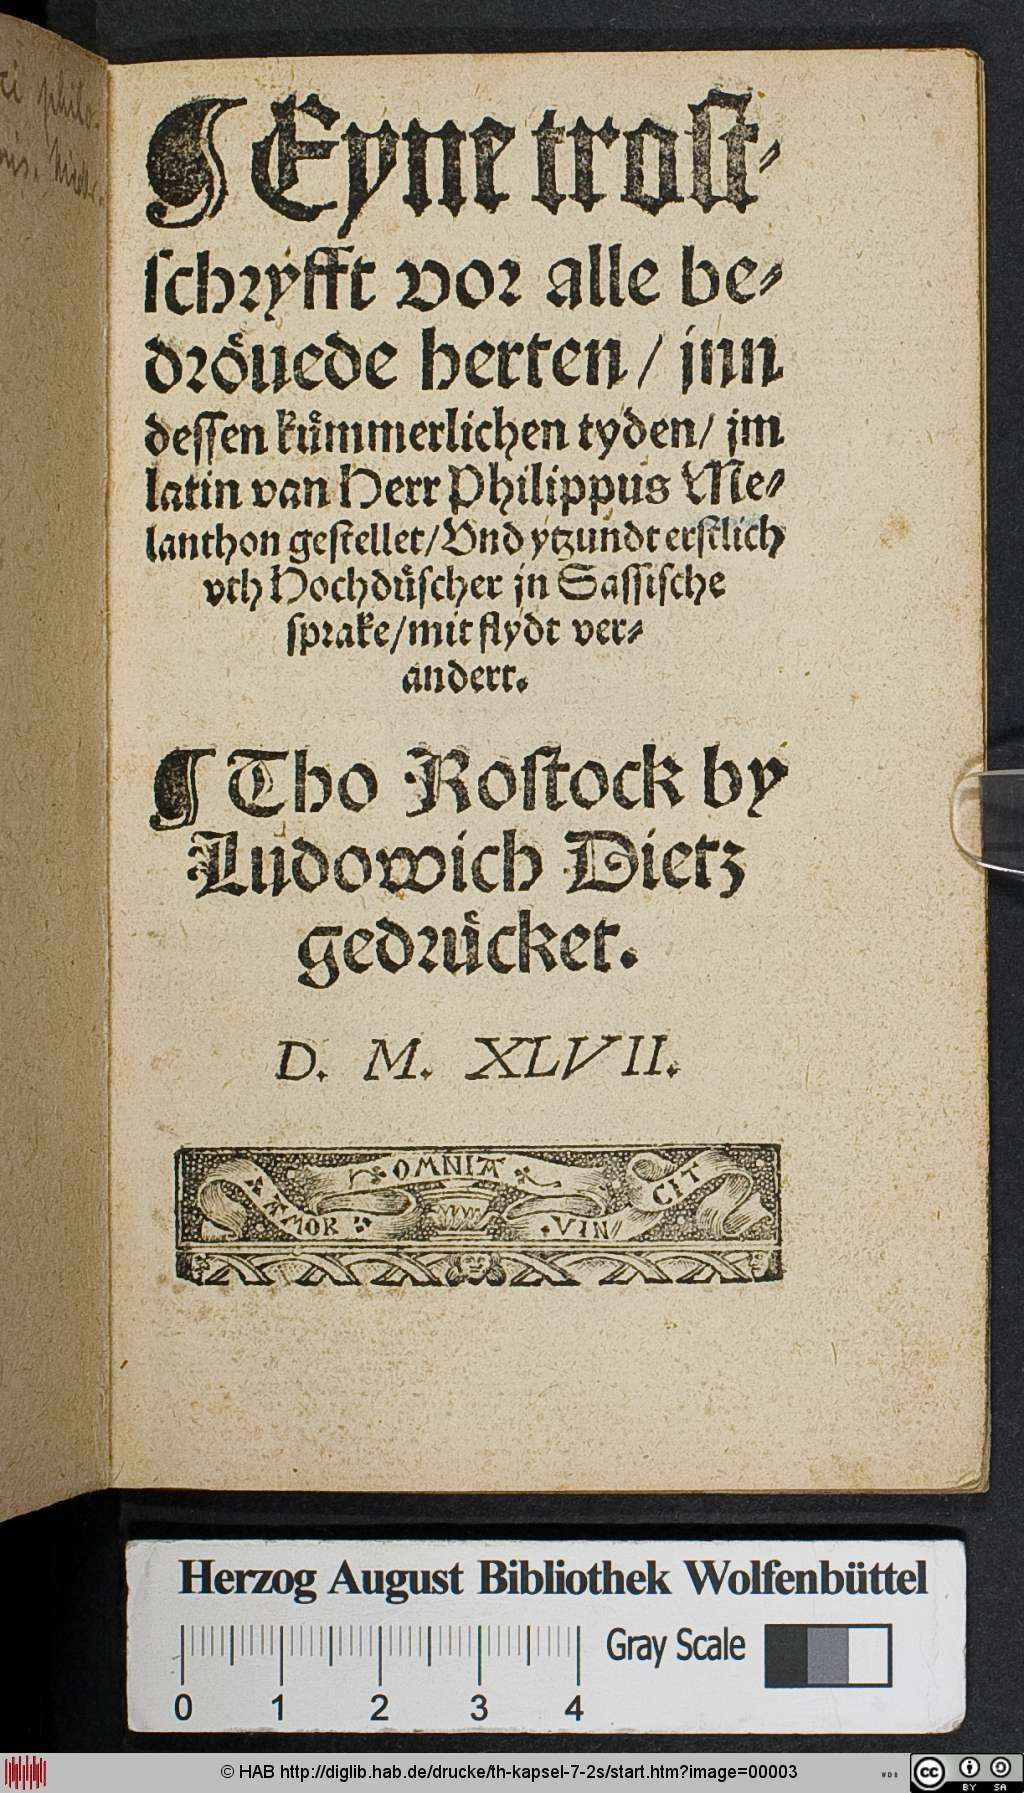 http://diglib.hab.de/drucke/th-kapsel-7-2s/00003.jpg